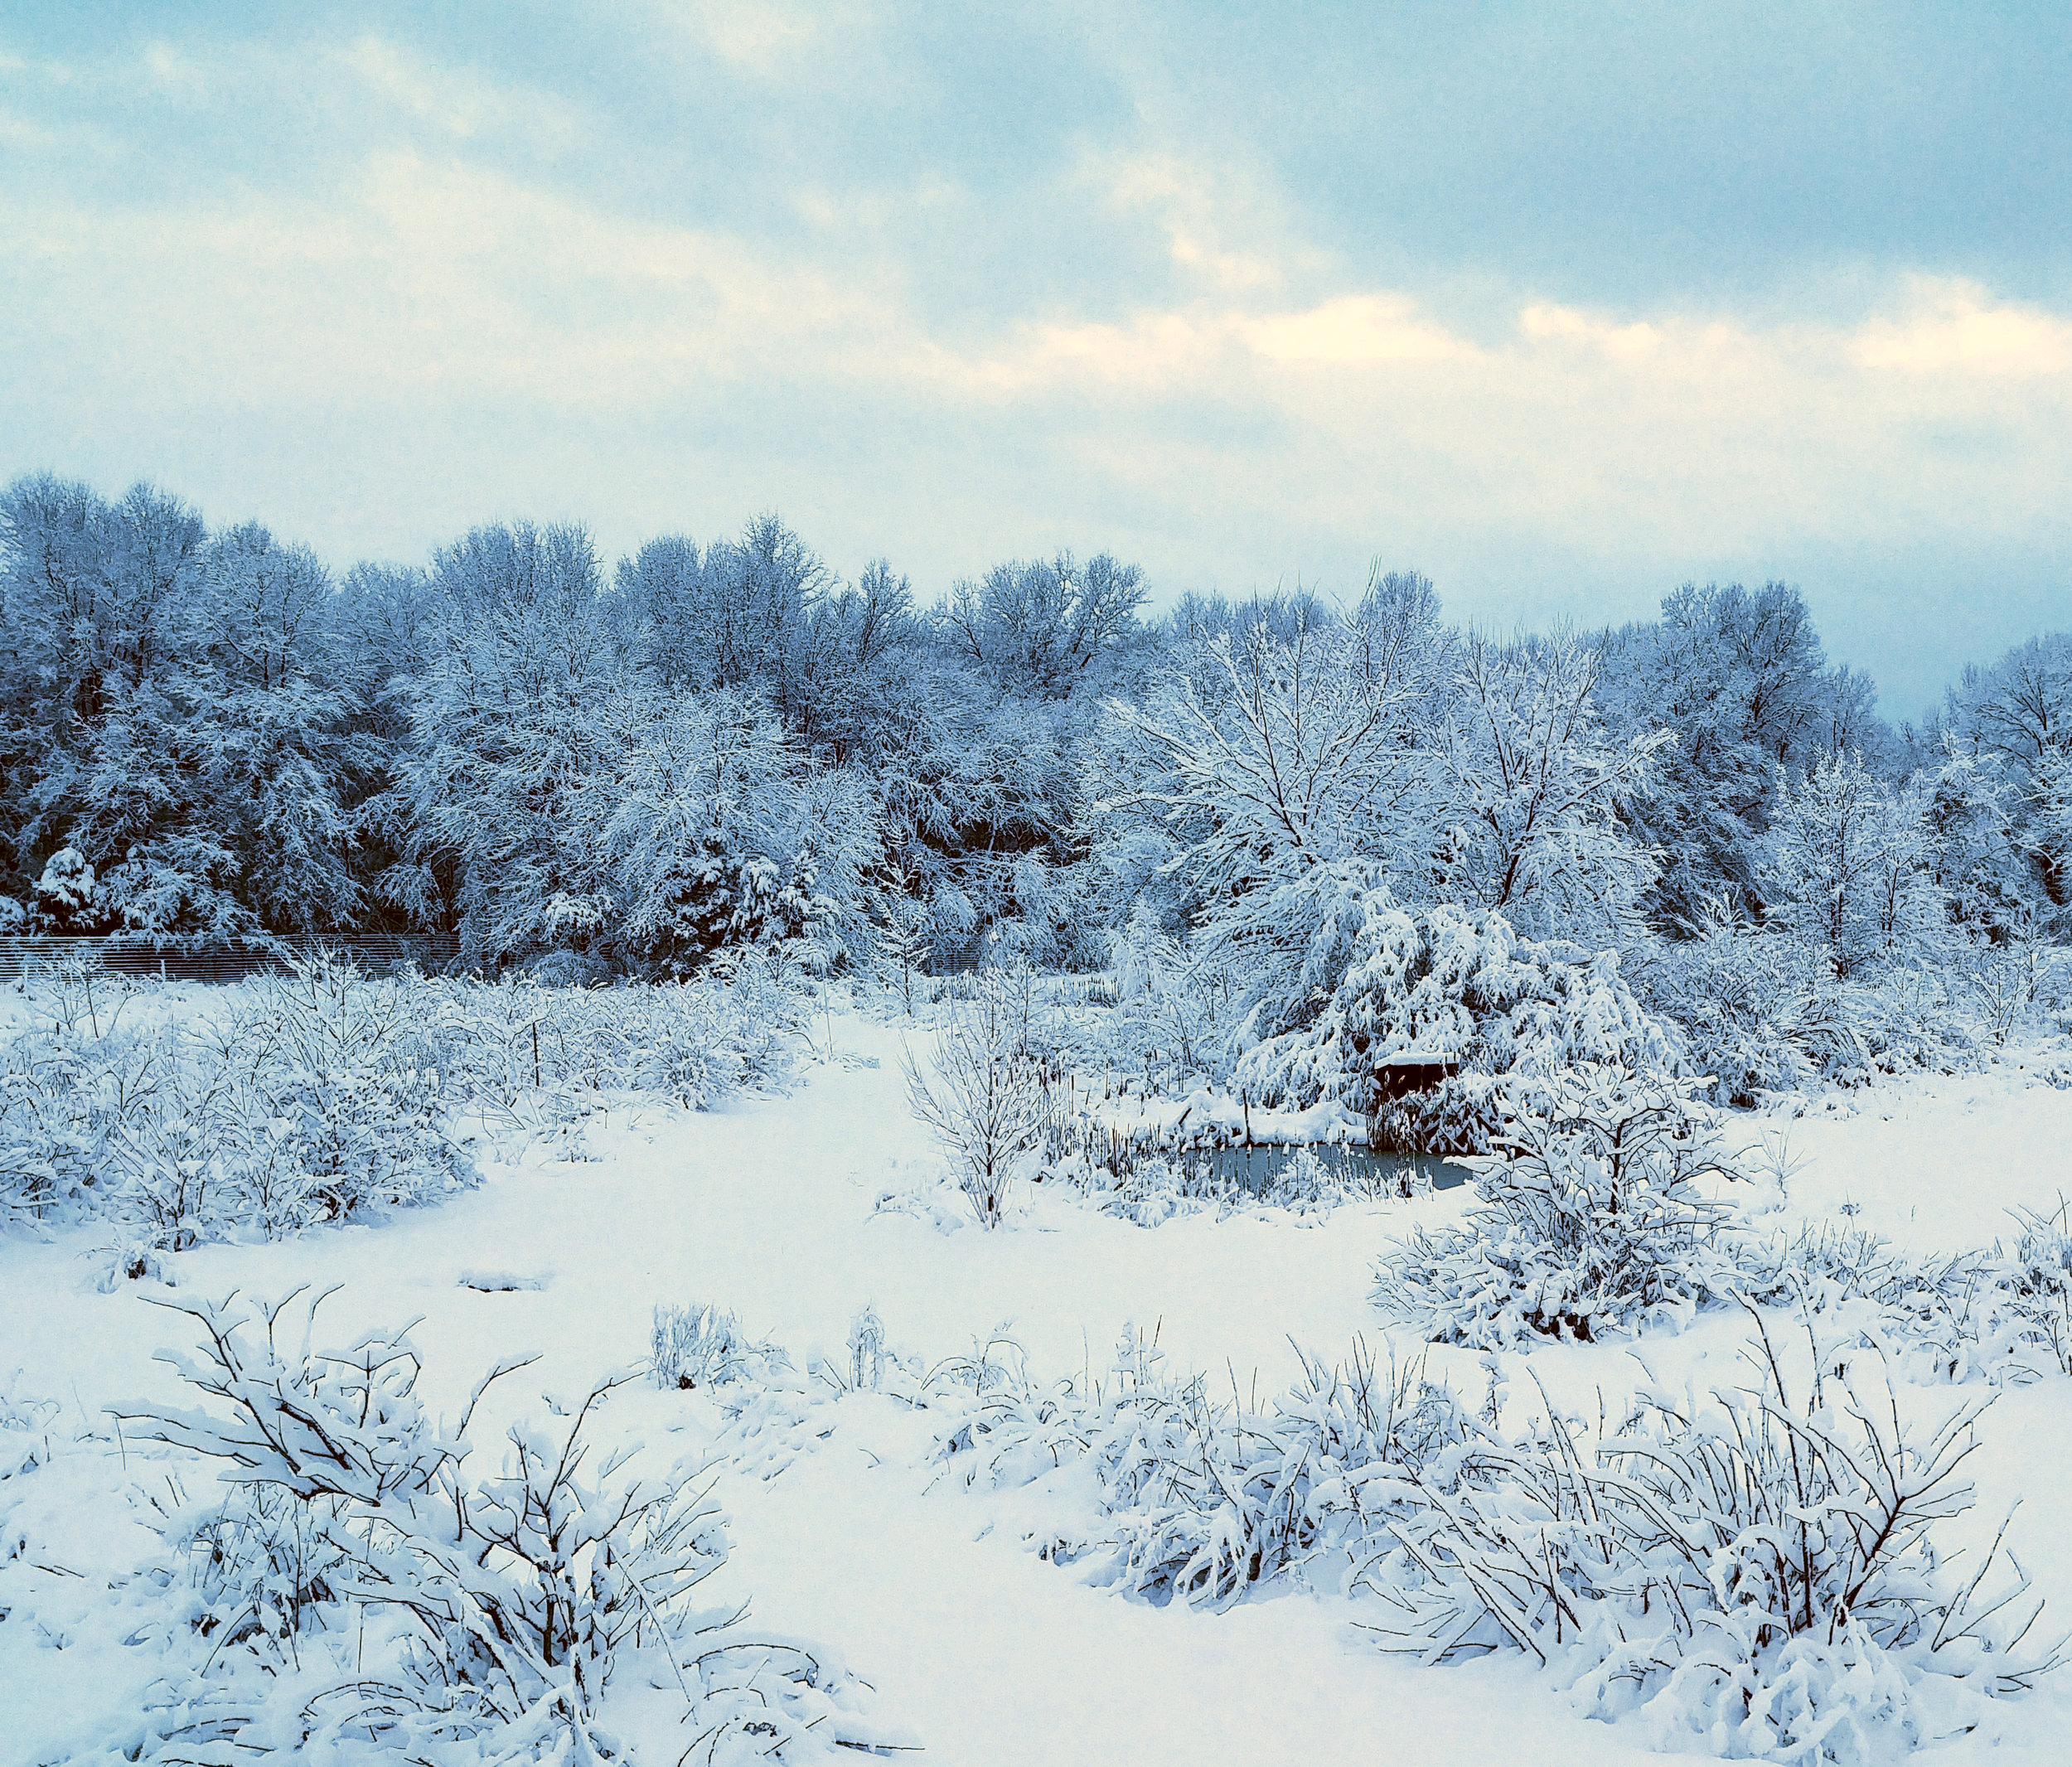 snow-center-field-0304190641_HDR.jpg